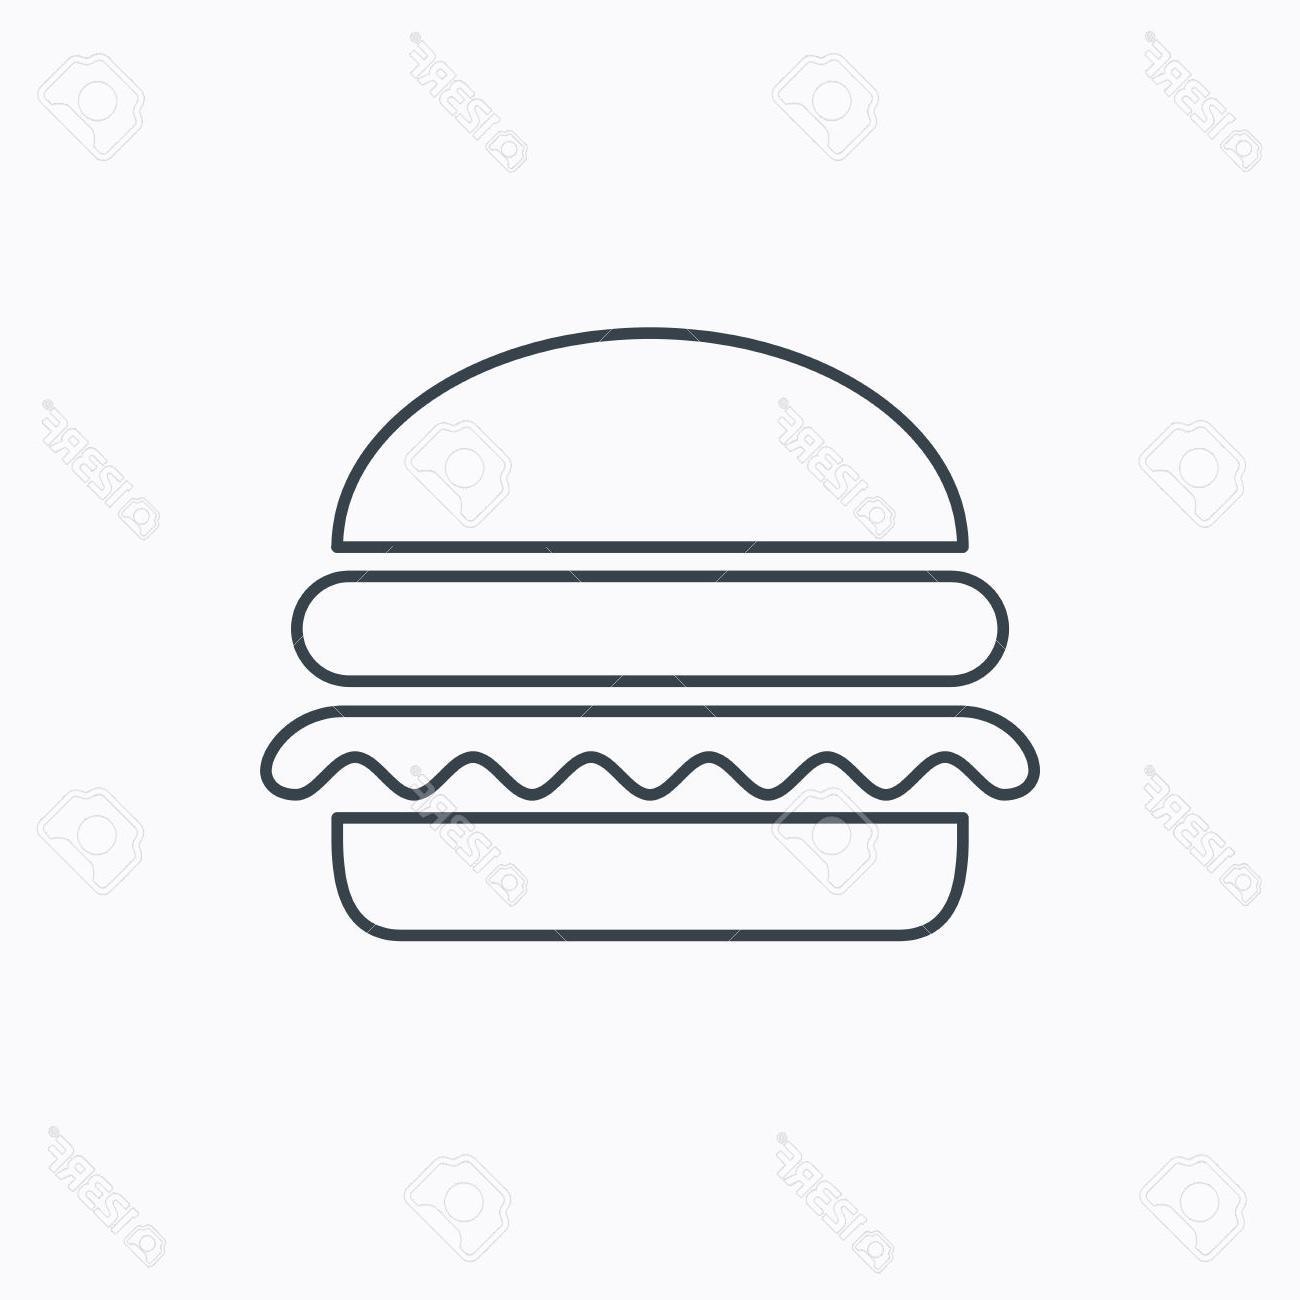 Best image vector art. Burger clipart outline